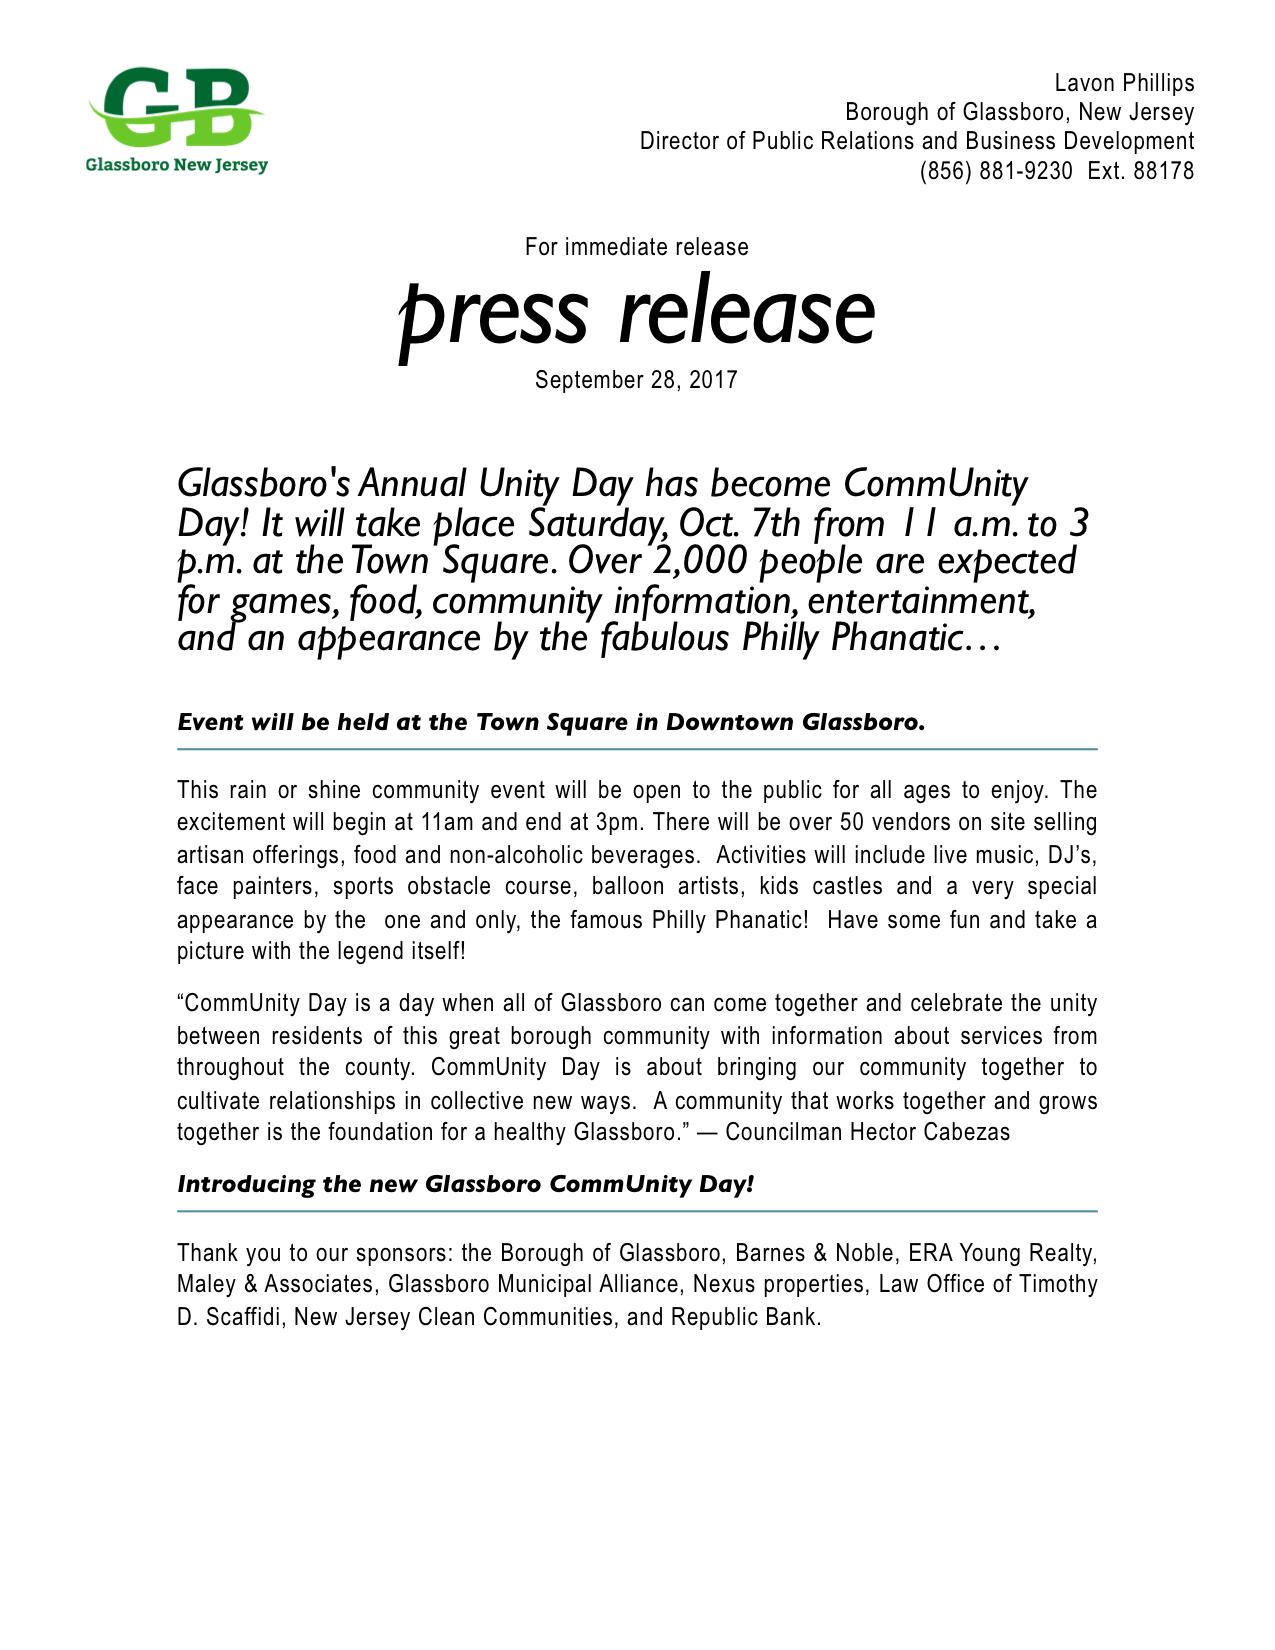 Introducing the new Glassboro CommUnity Day!